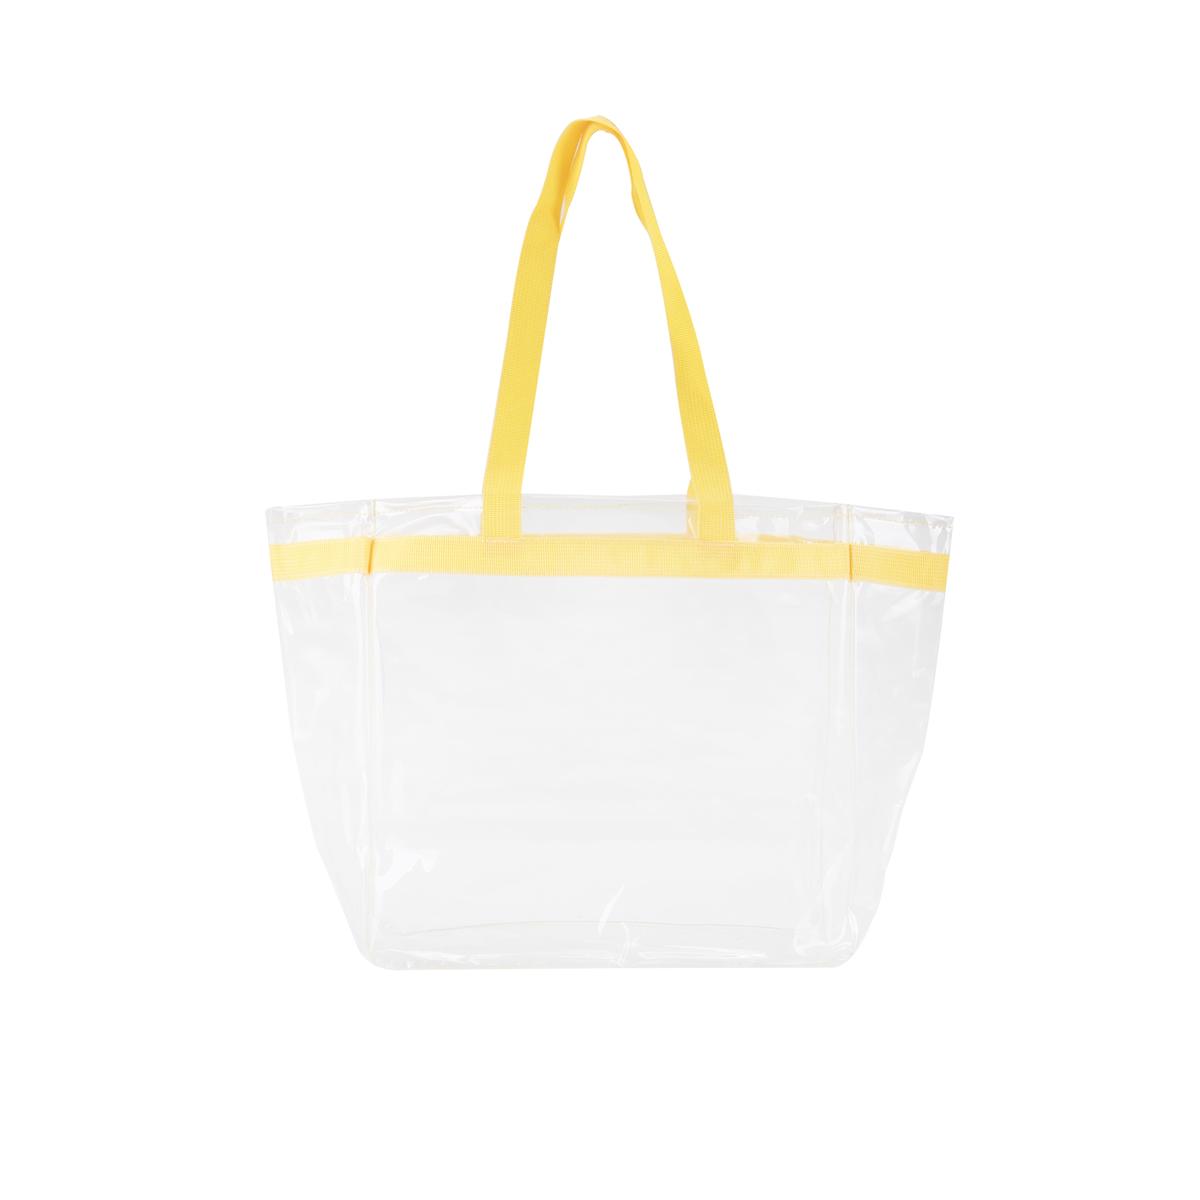 Color Handles Clear Plastic Tote Bags 125237 Custom